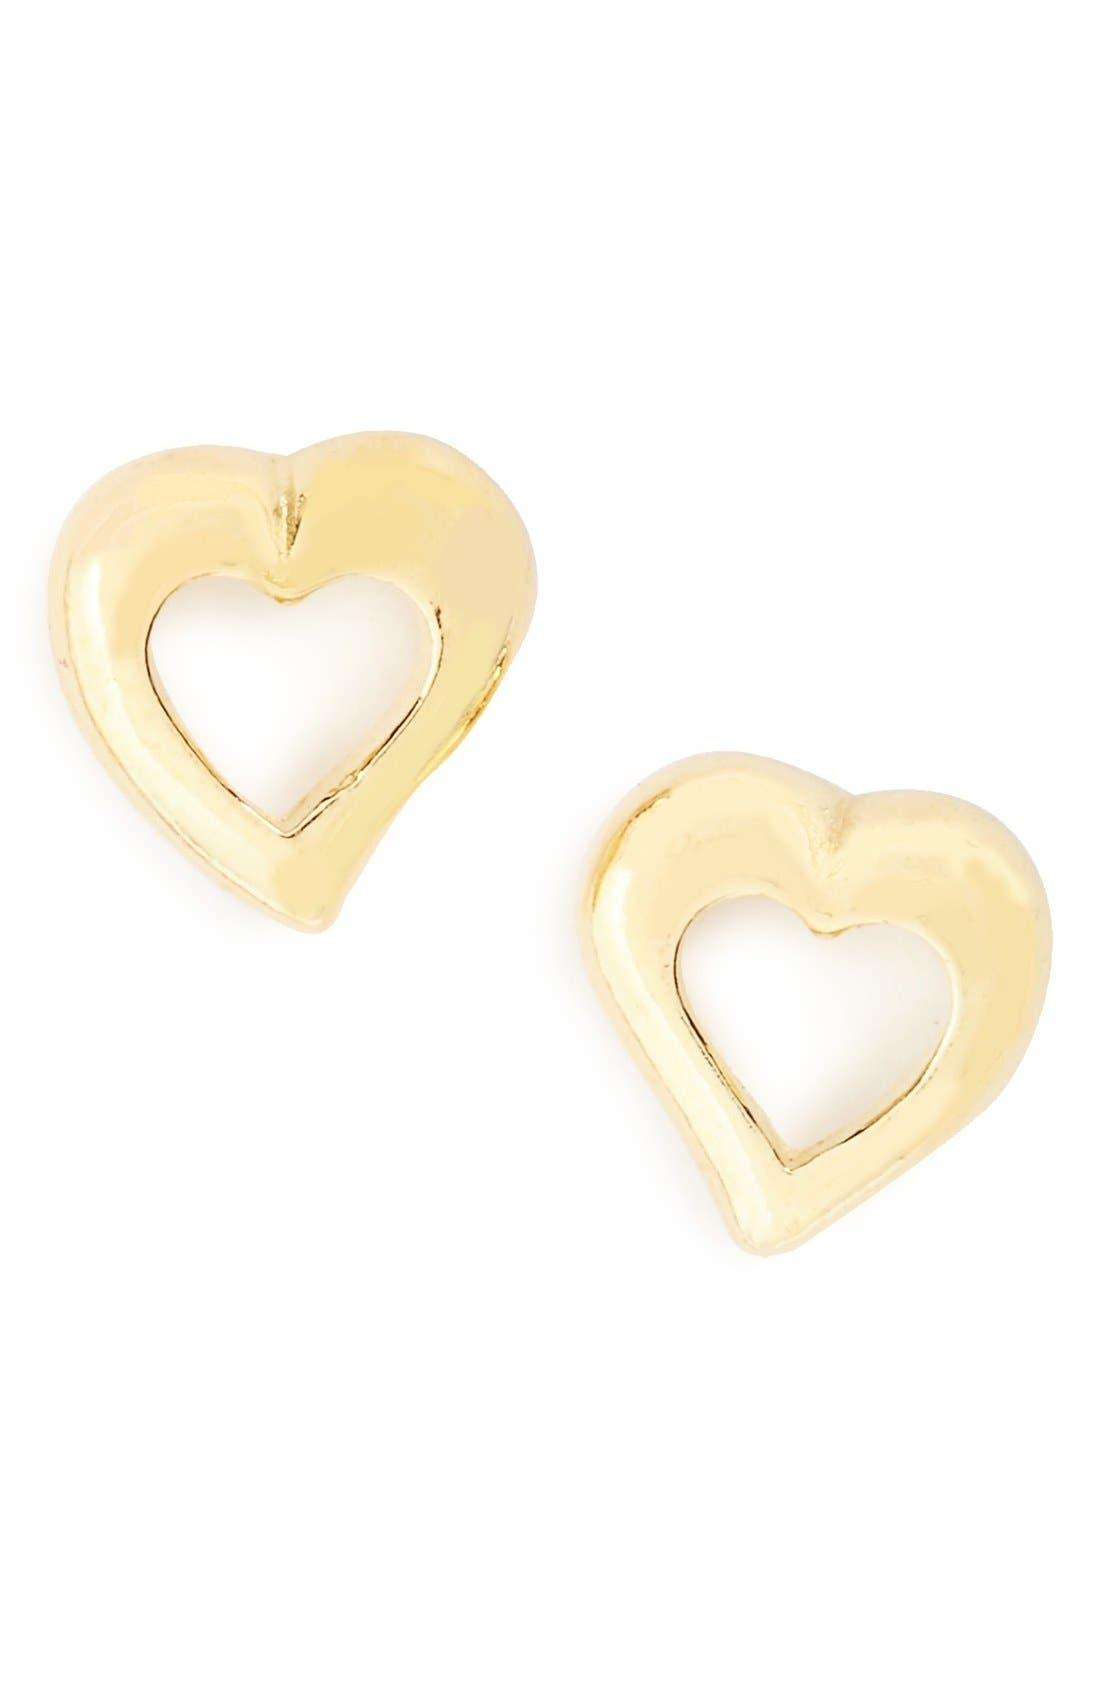 Alternate Image 1 Selected - Tomas Sterling Silver Heart Earrings (Girls)